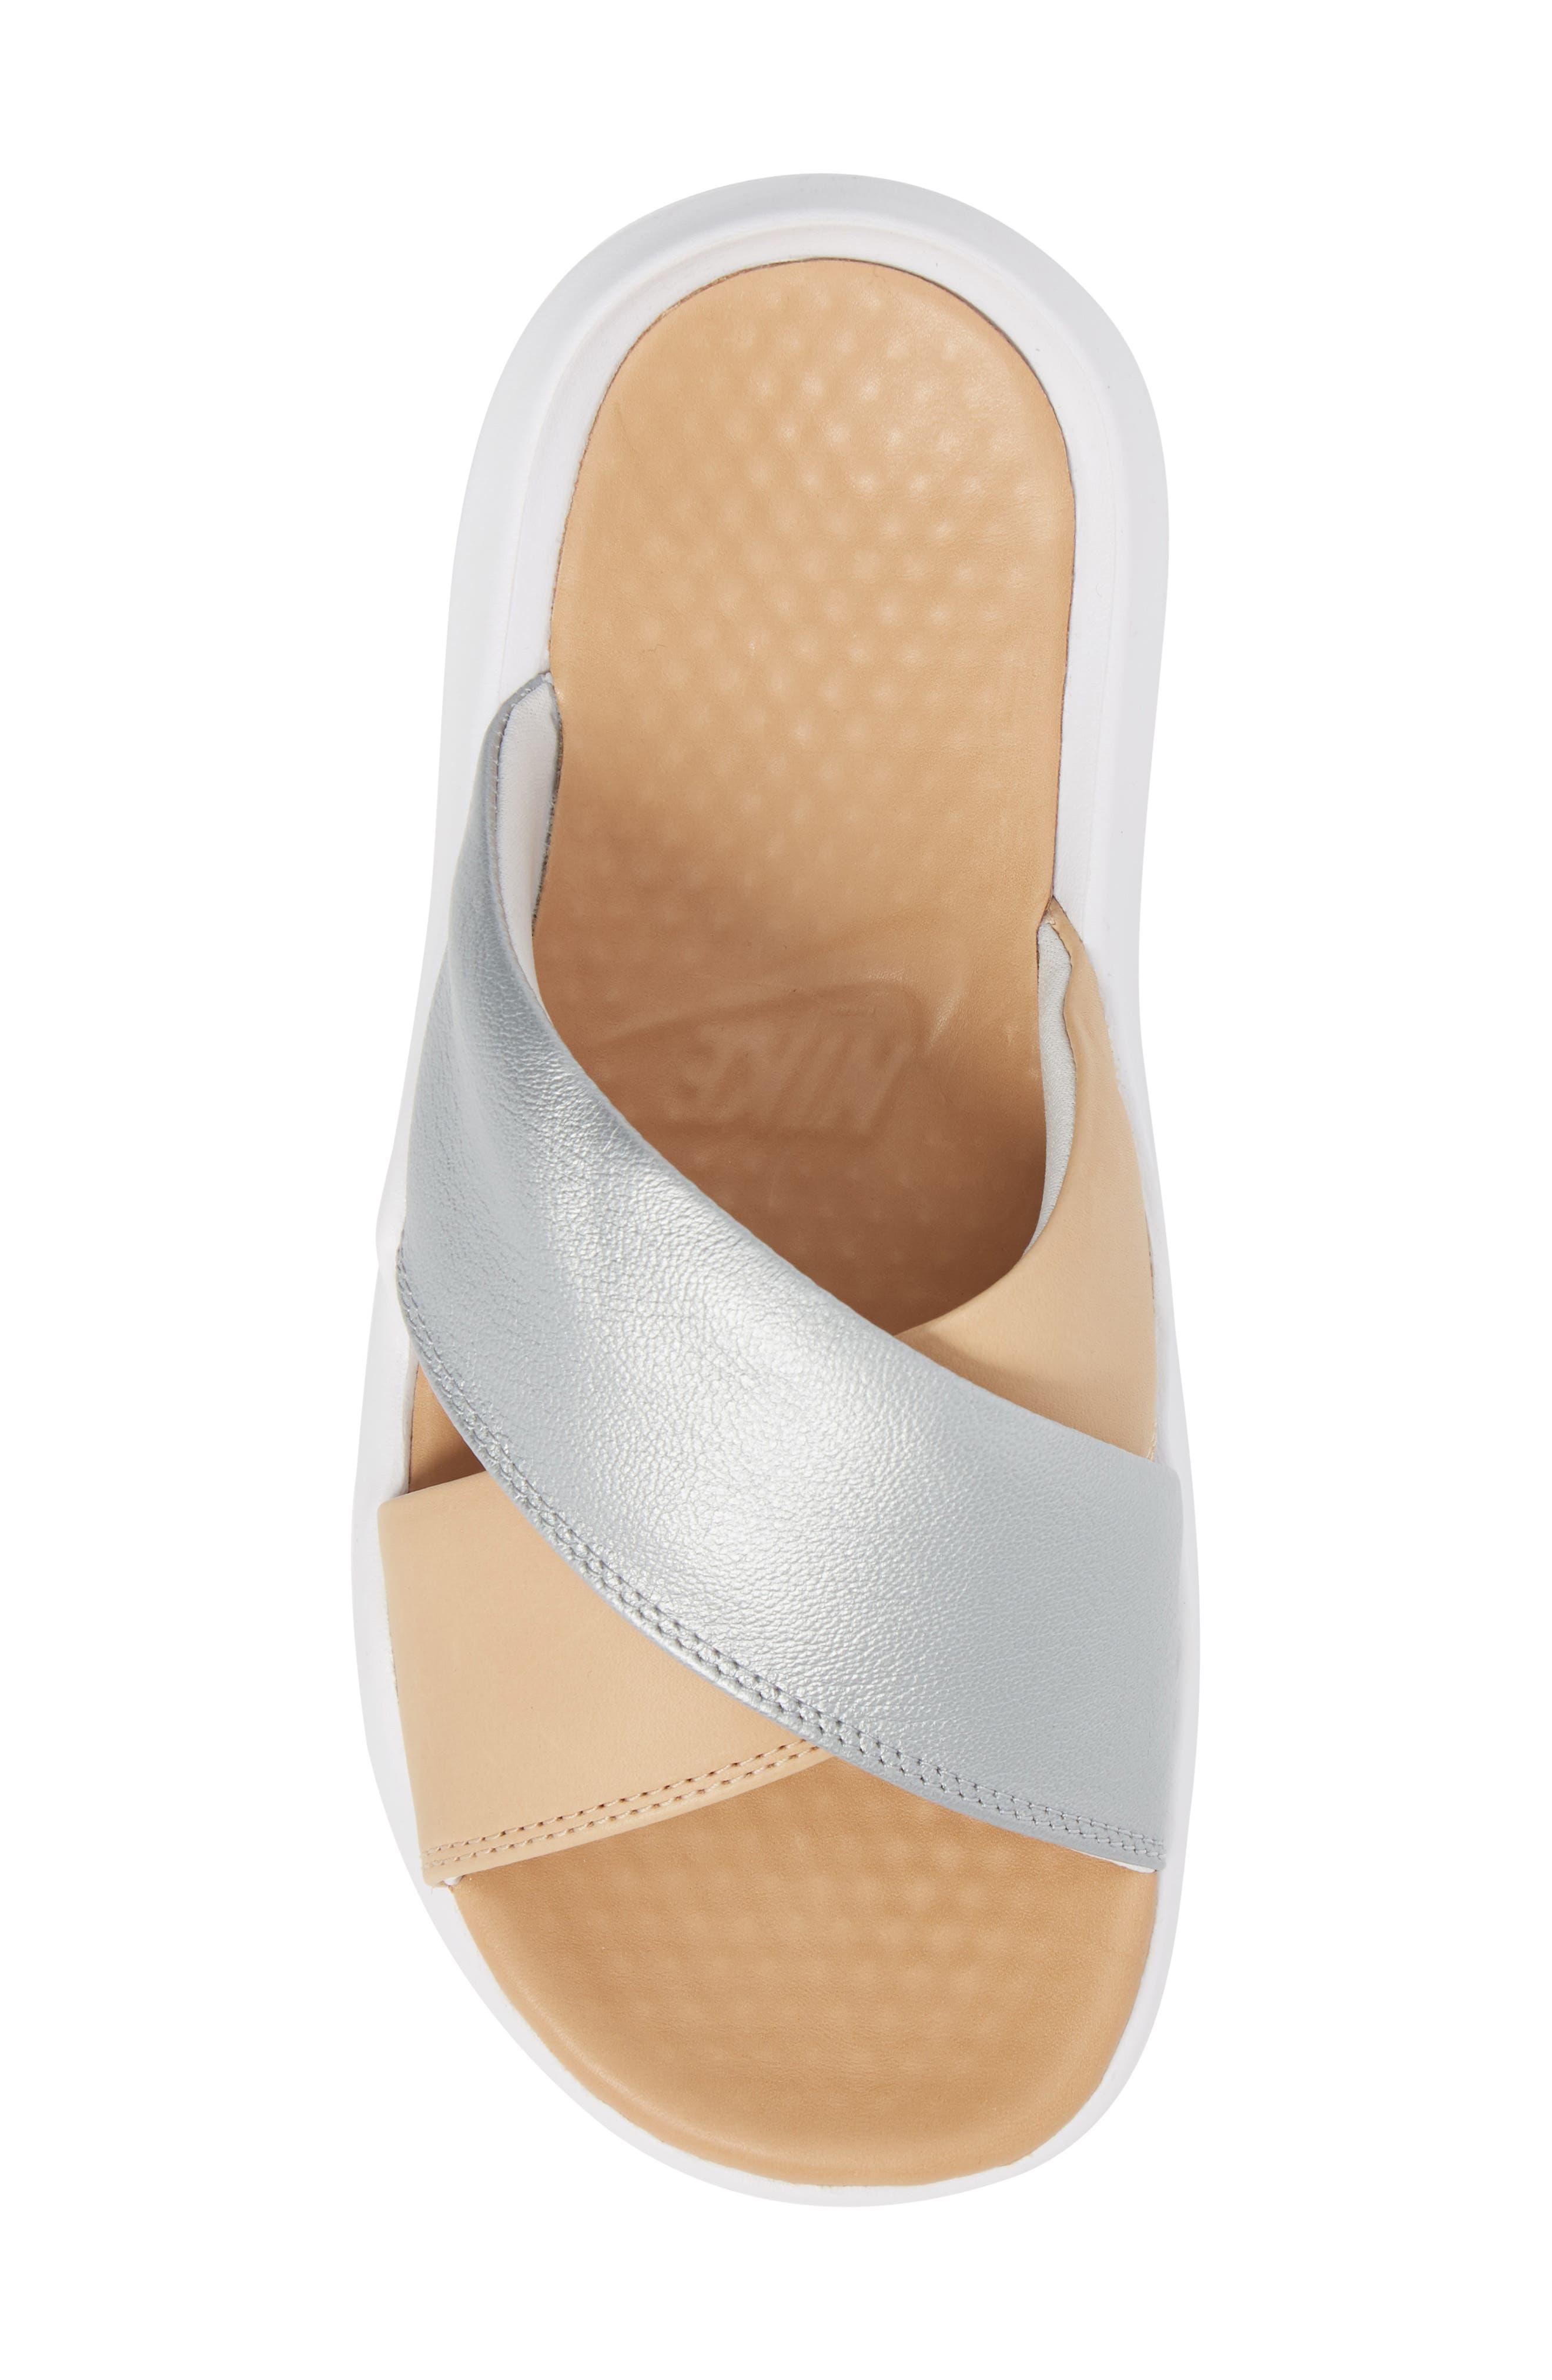 Nordstrom x Nike Benassi Future Cross SE Premium Slide,                             Alternate thumbnail 5, color,                             METALLIC SILVER/ BIO BEIGE